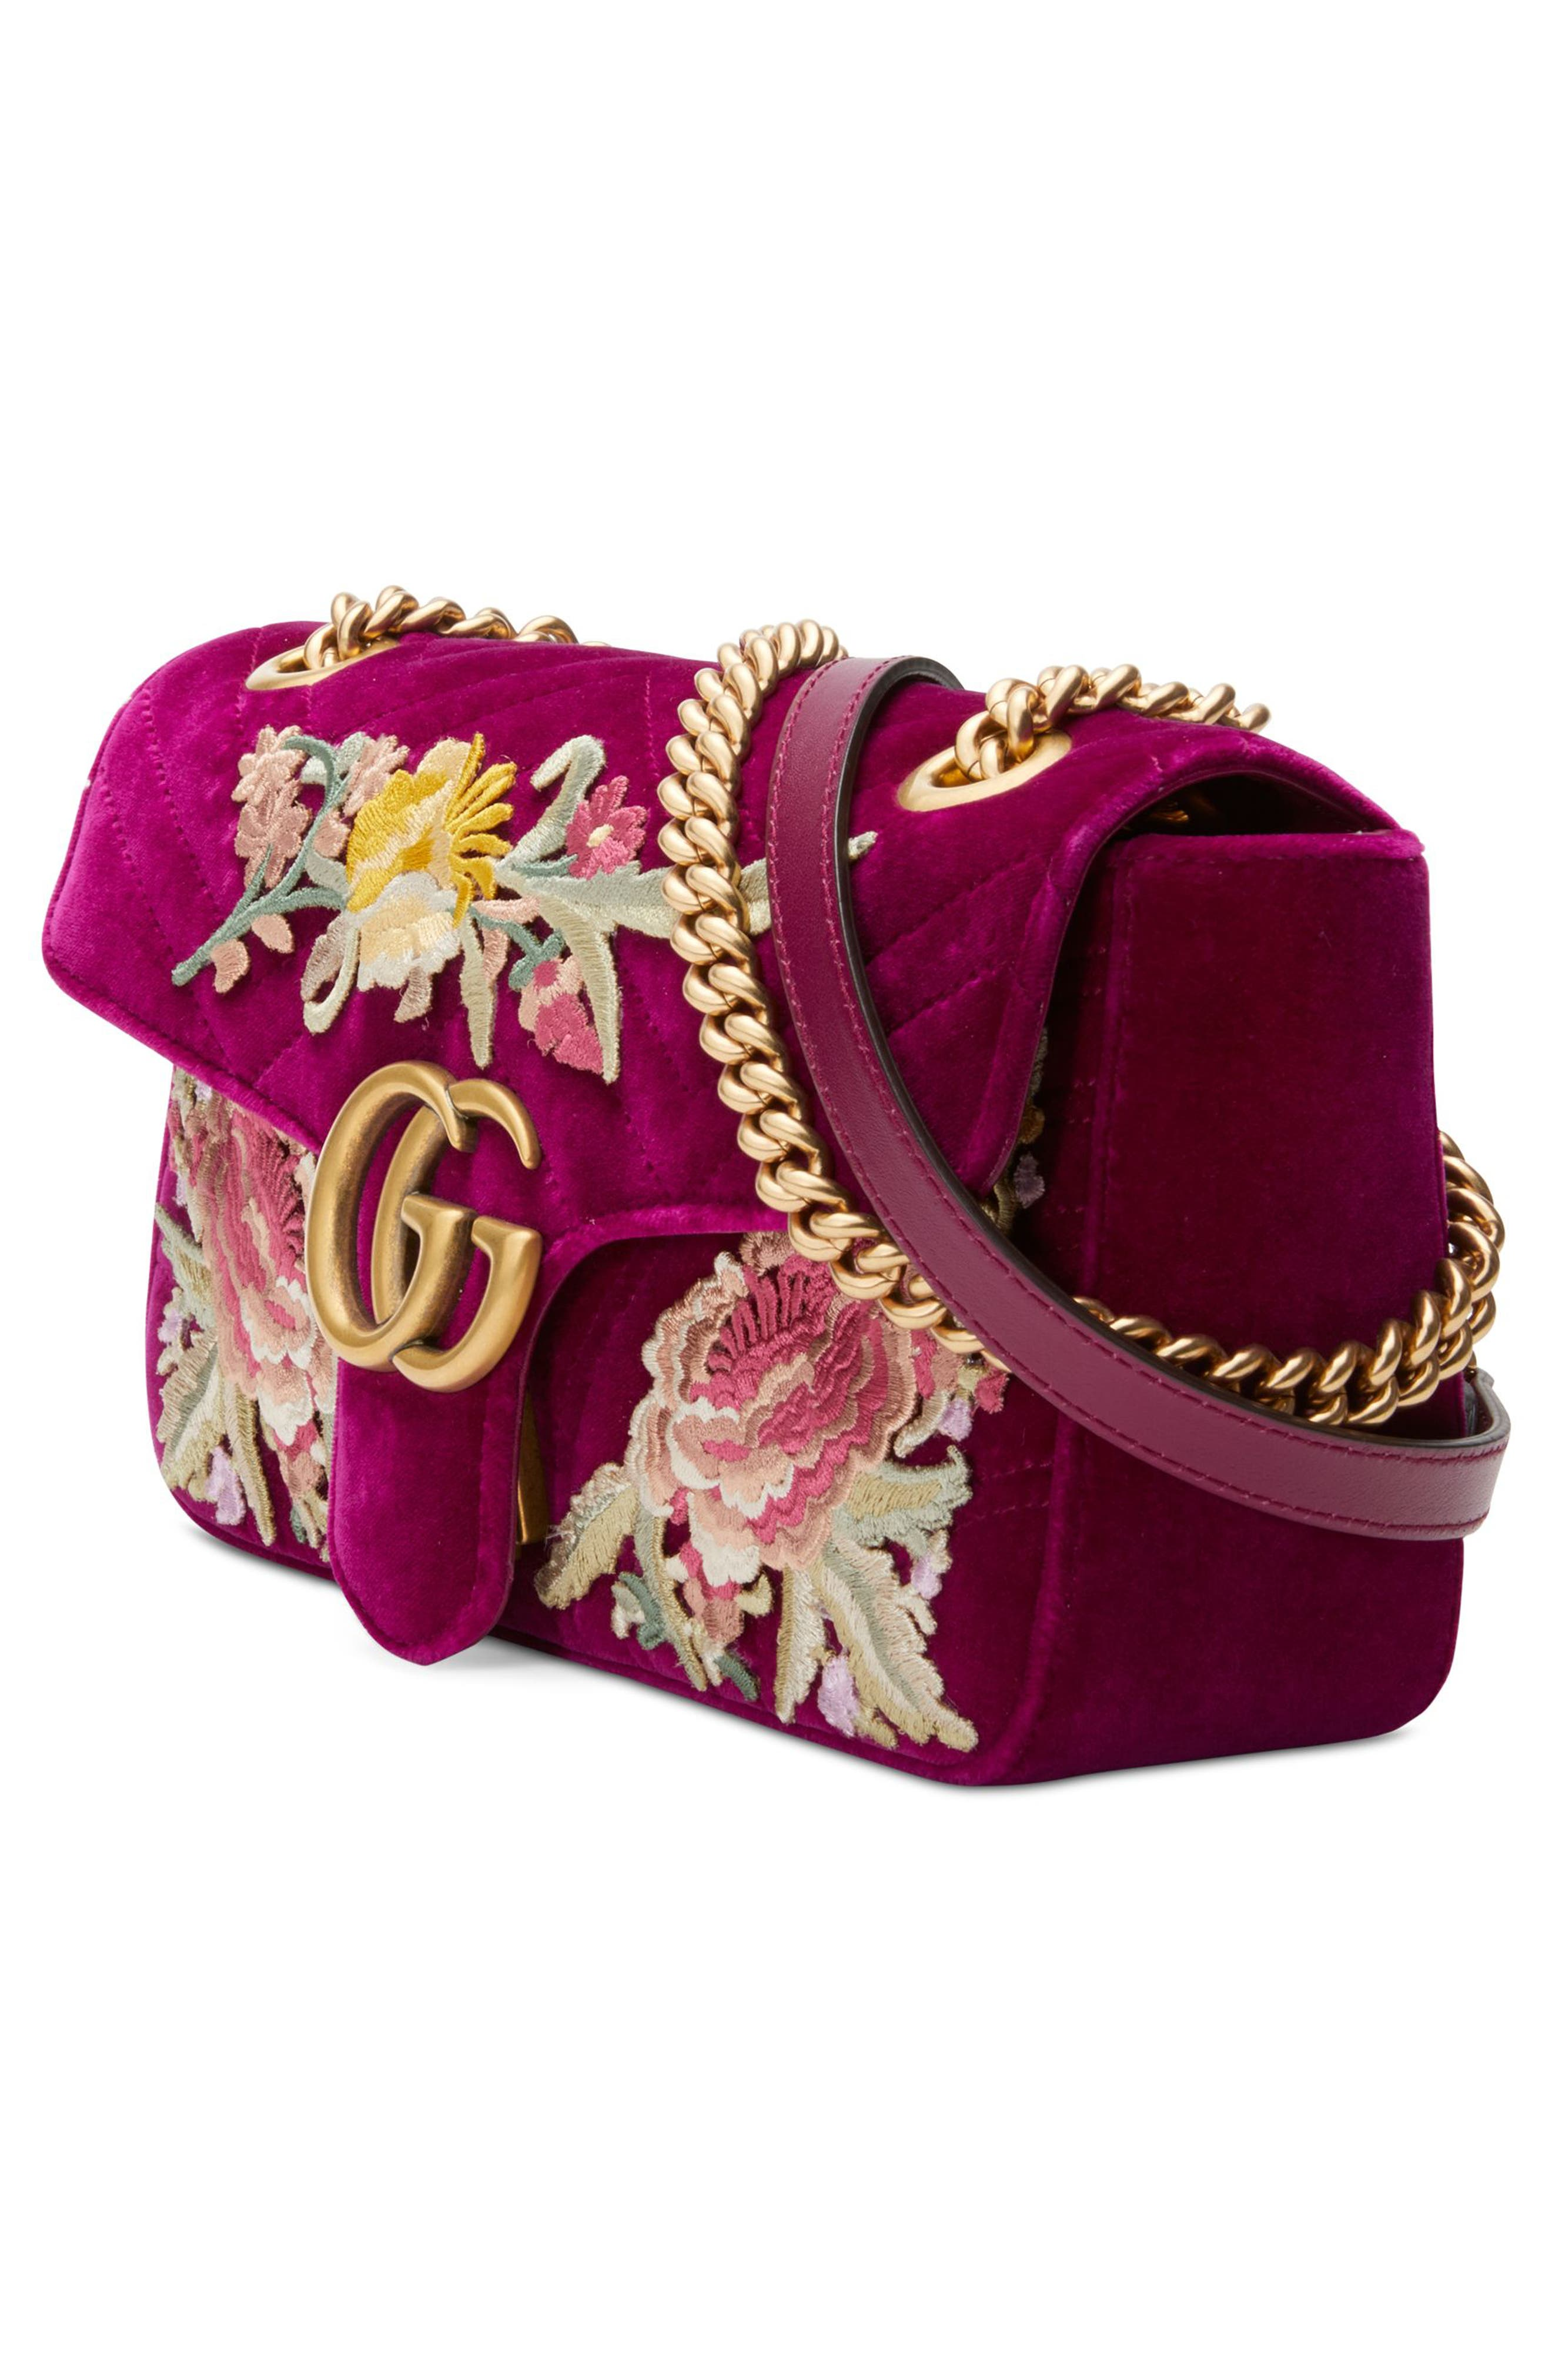 Small GG Marmont 2.0 Matelassé Velvet Shoulder Bag,                             Alternate thumbnail 4, color,                             Fuchsia/ Fuchsia